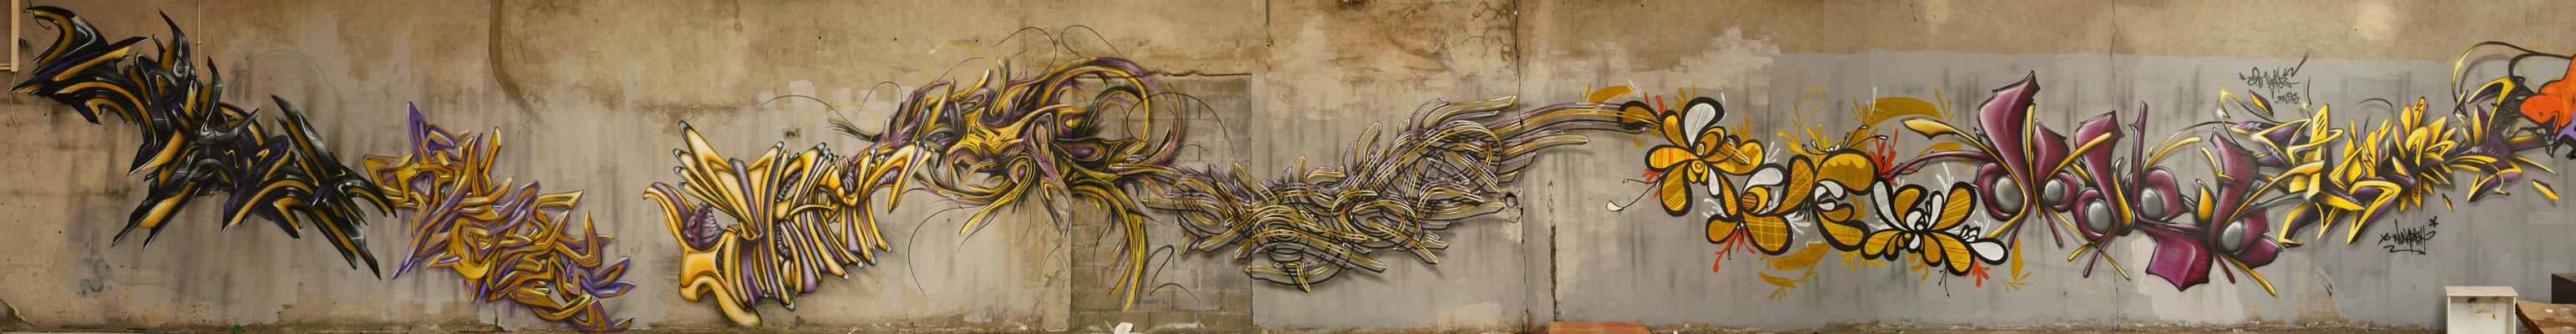 02.2009_ApashToulouse